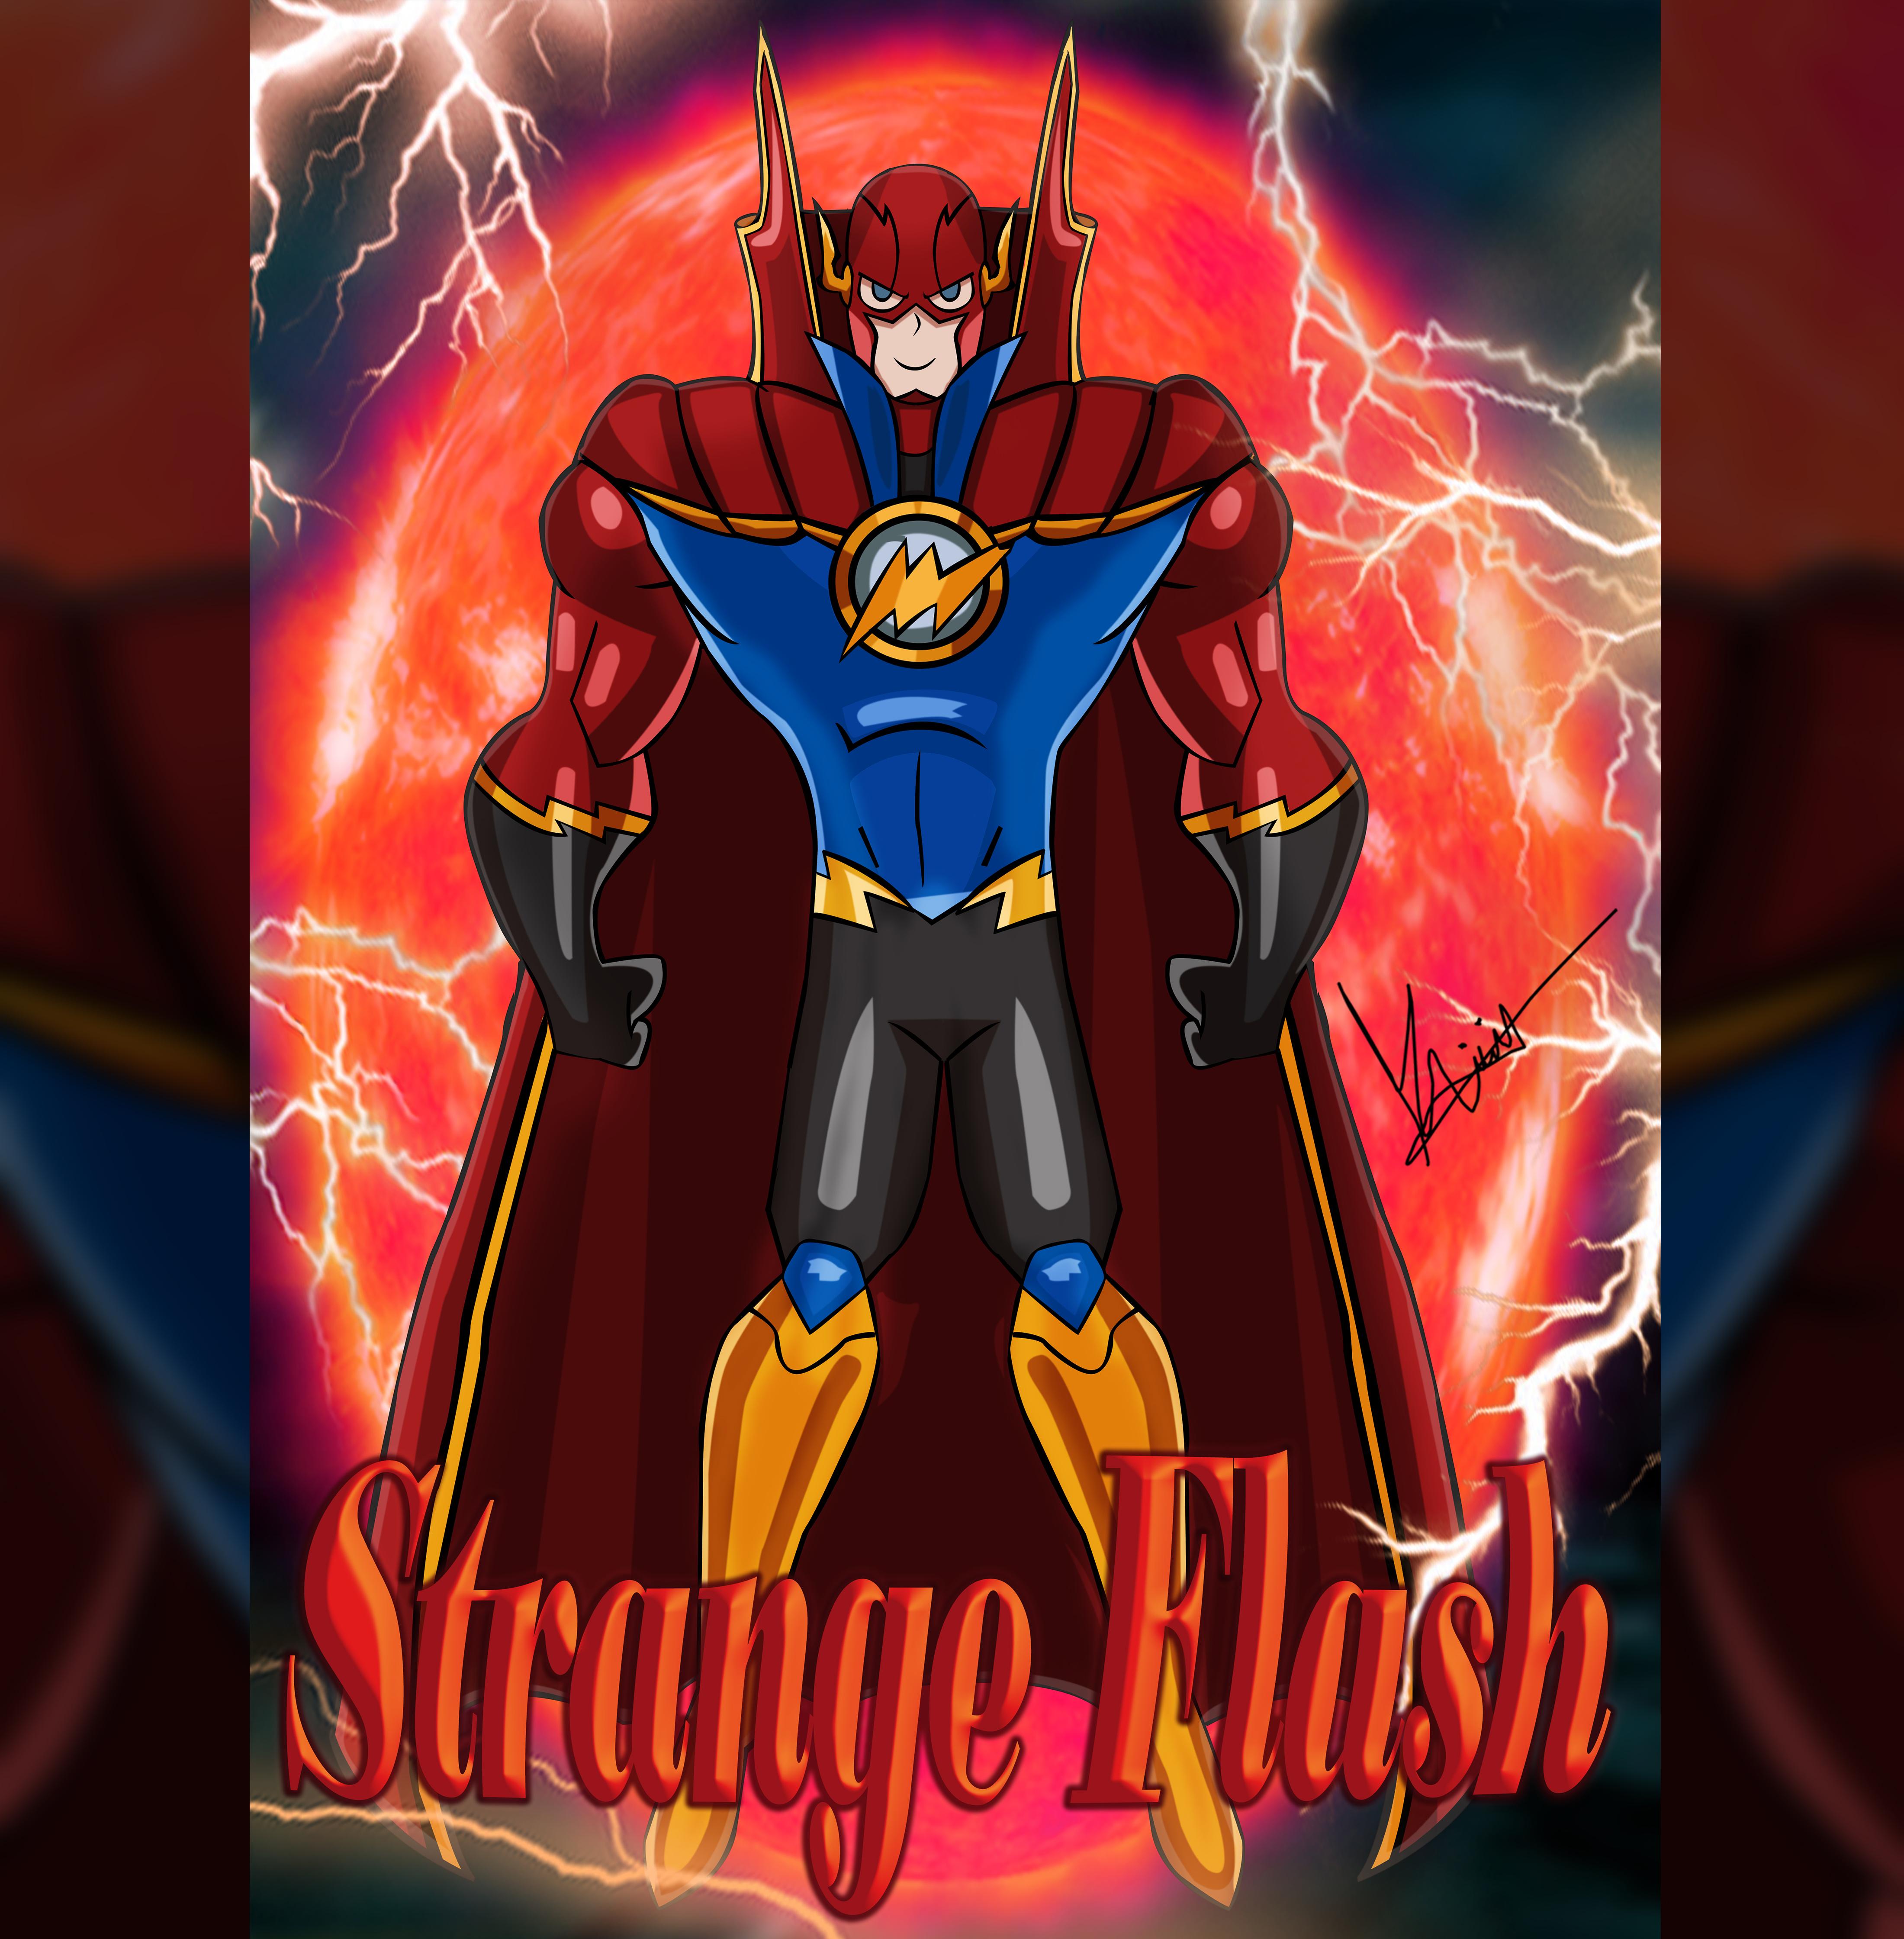 Strange Flash Superhero